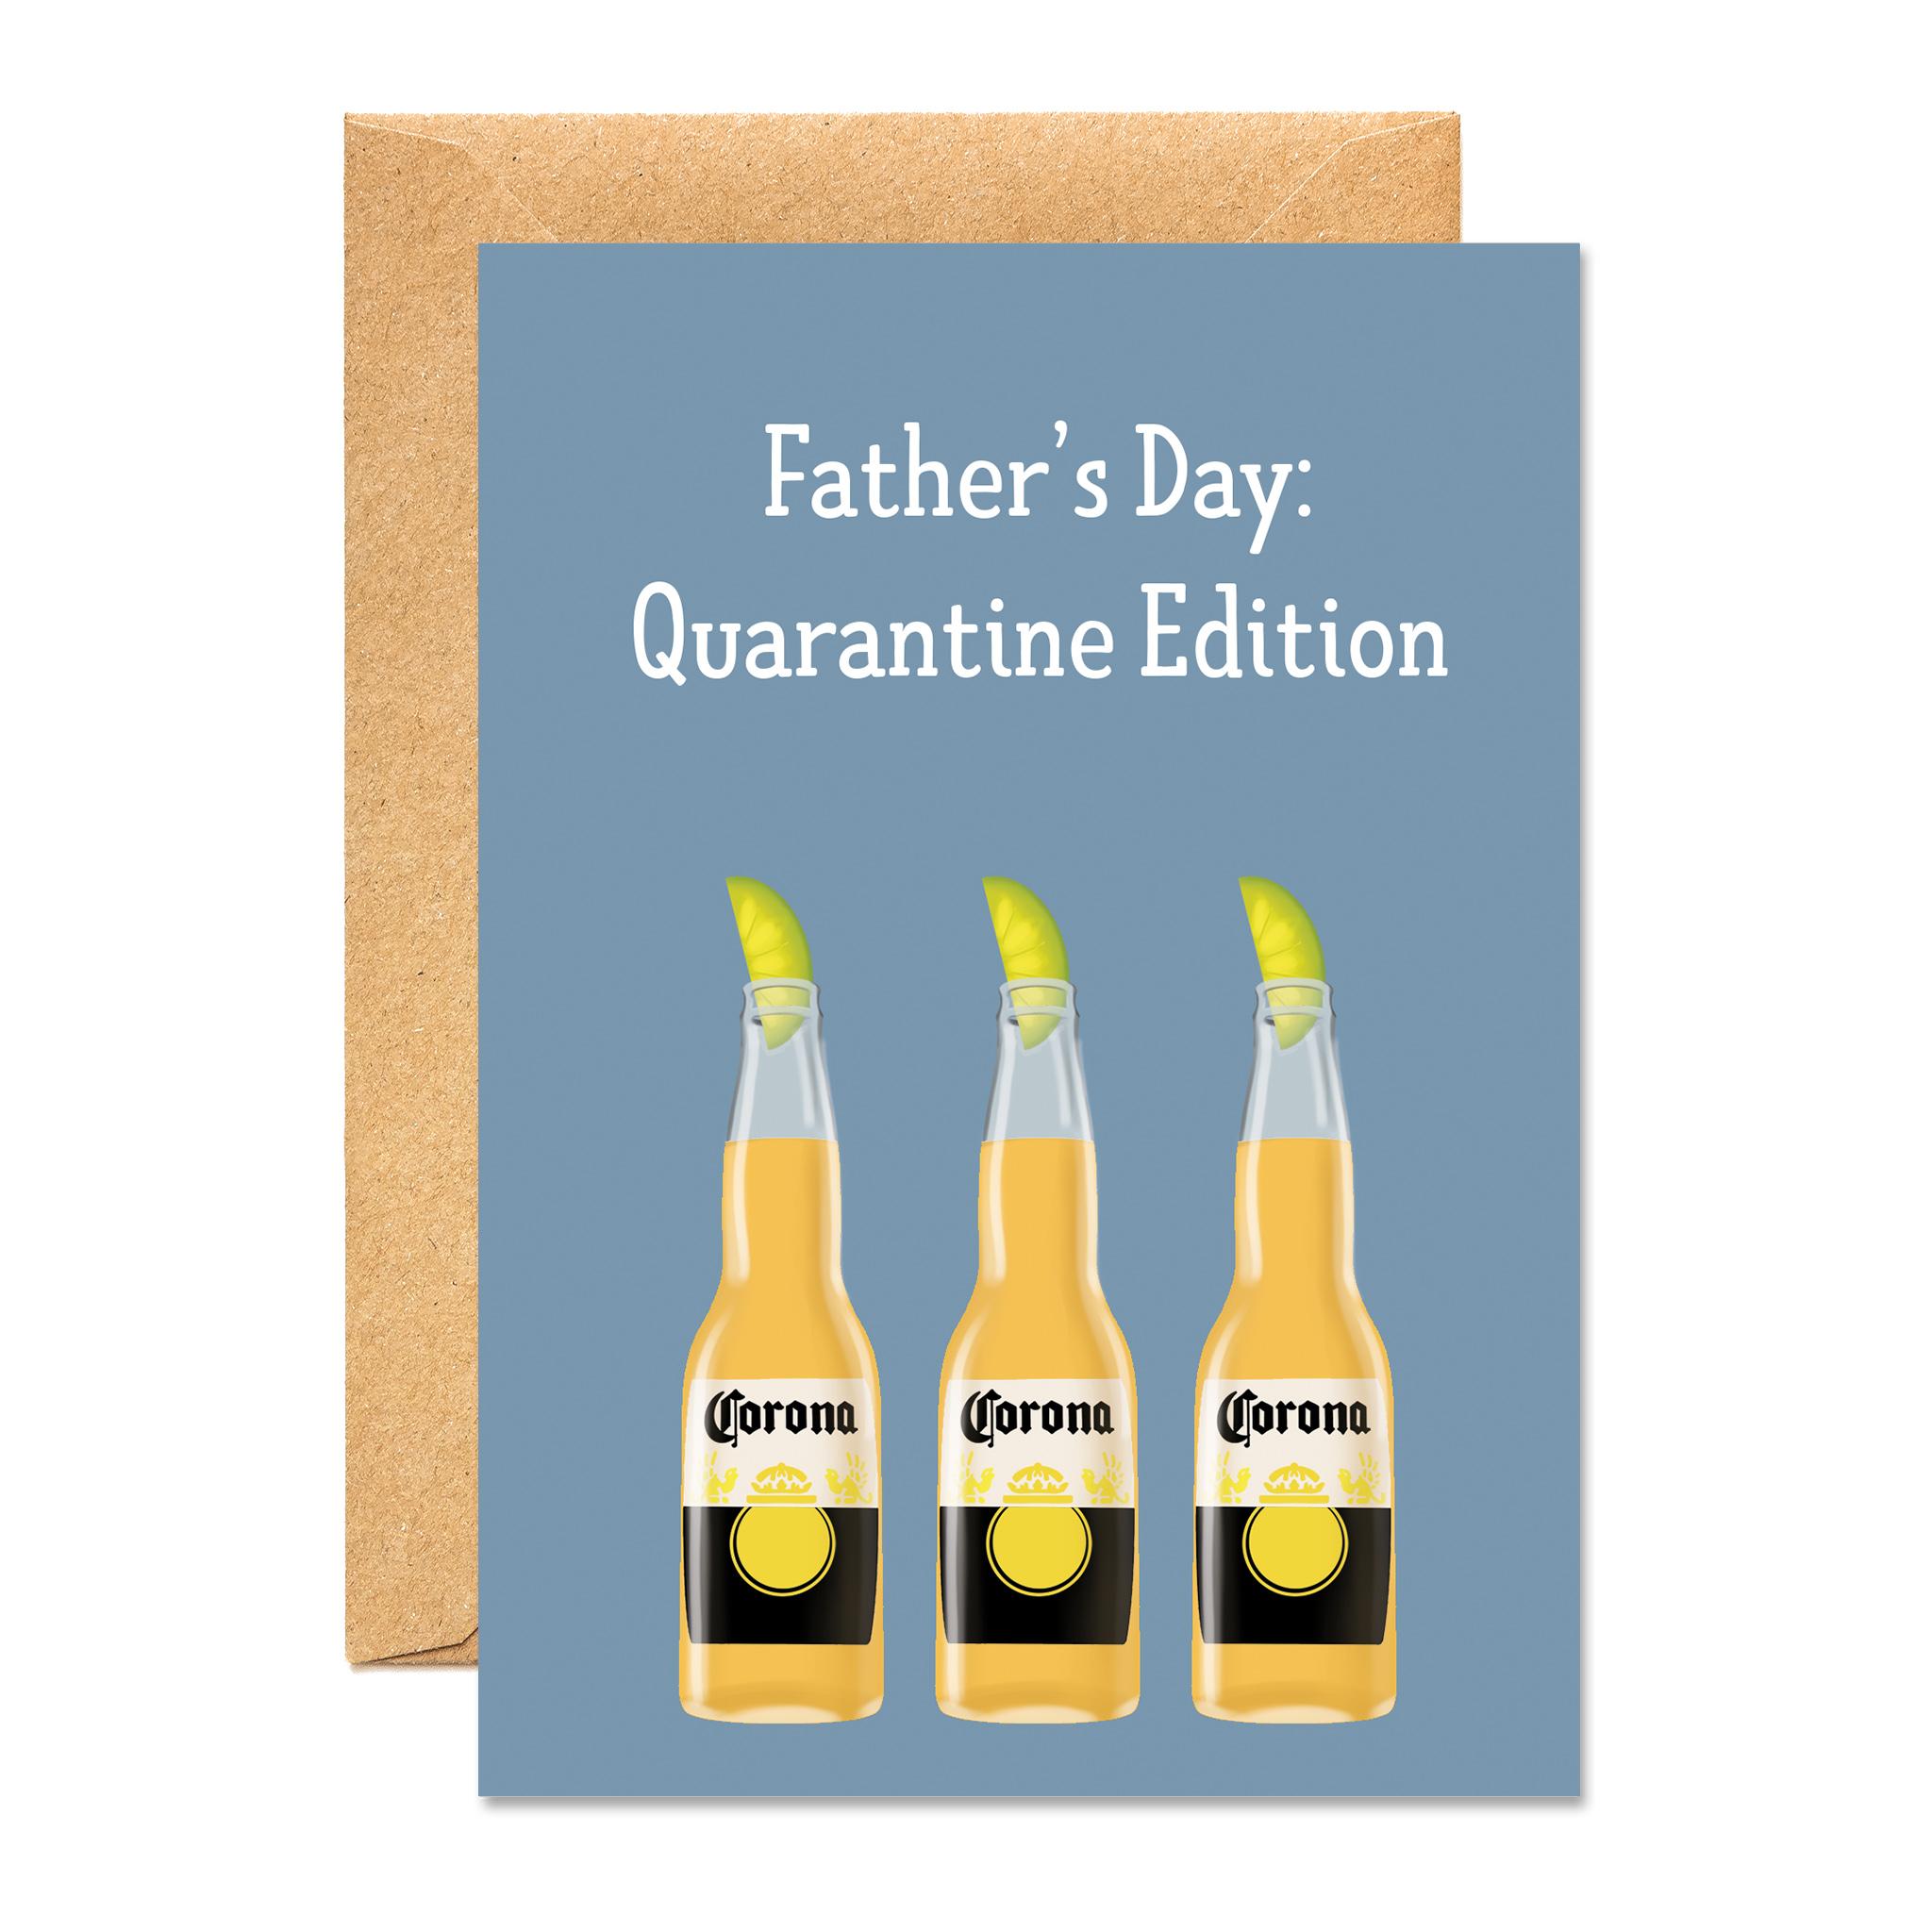 Father's Day- Quarantine Edition